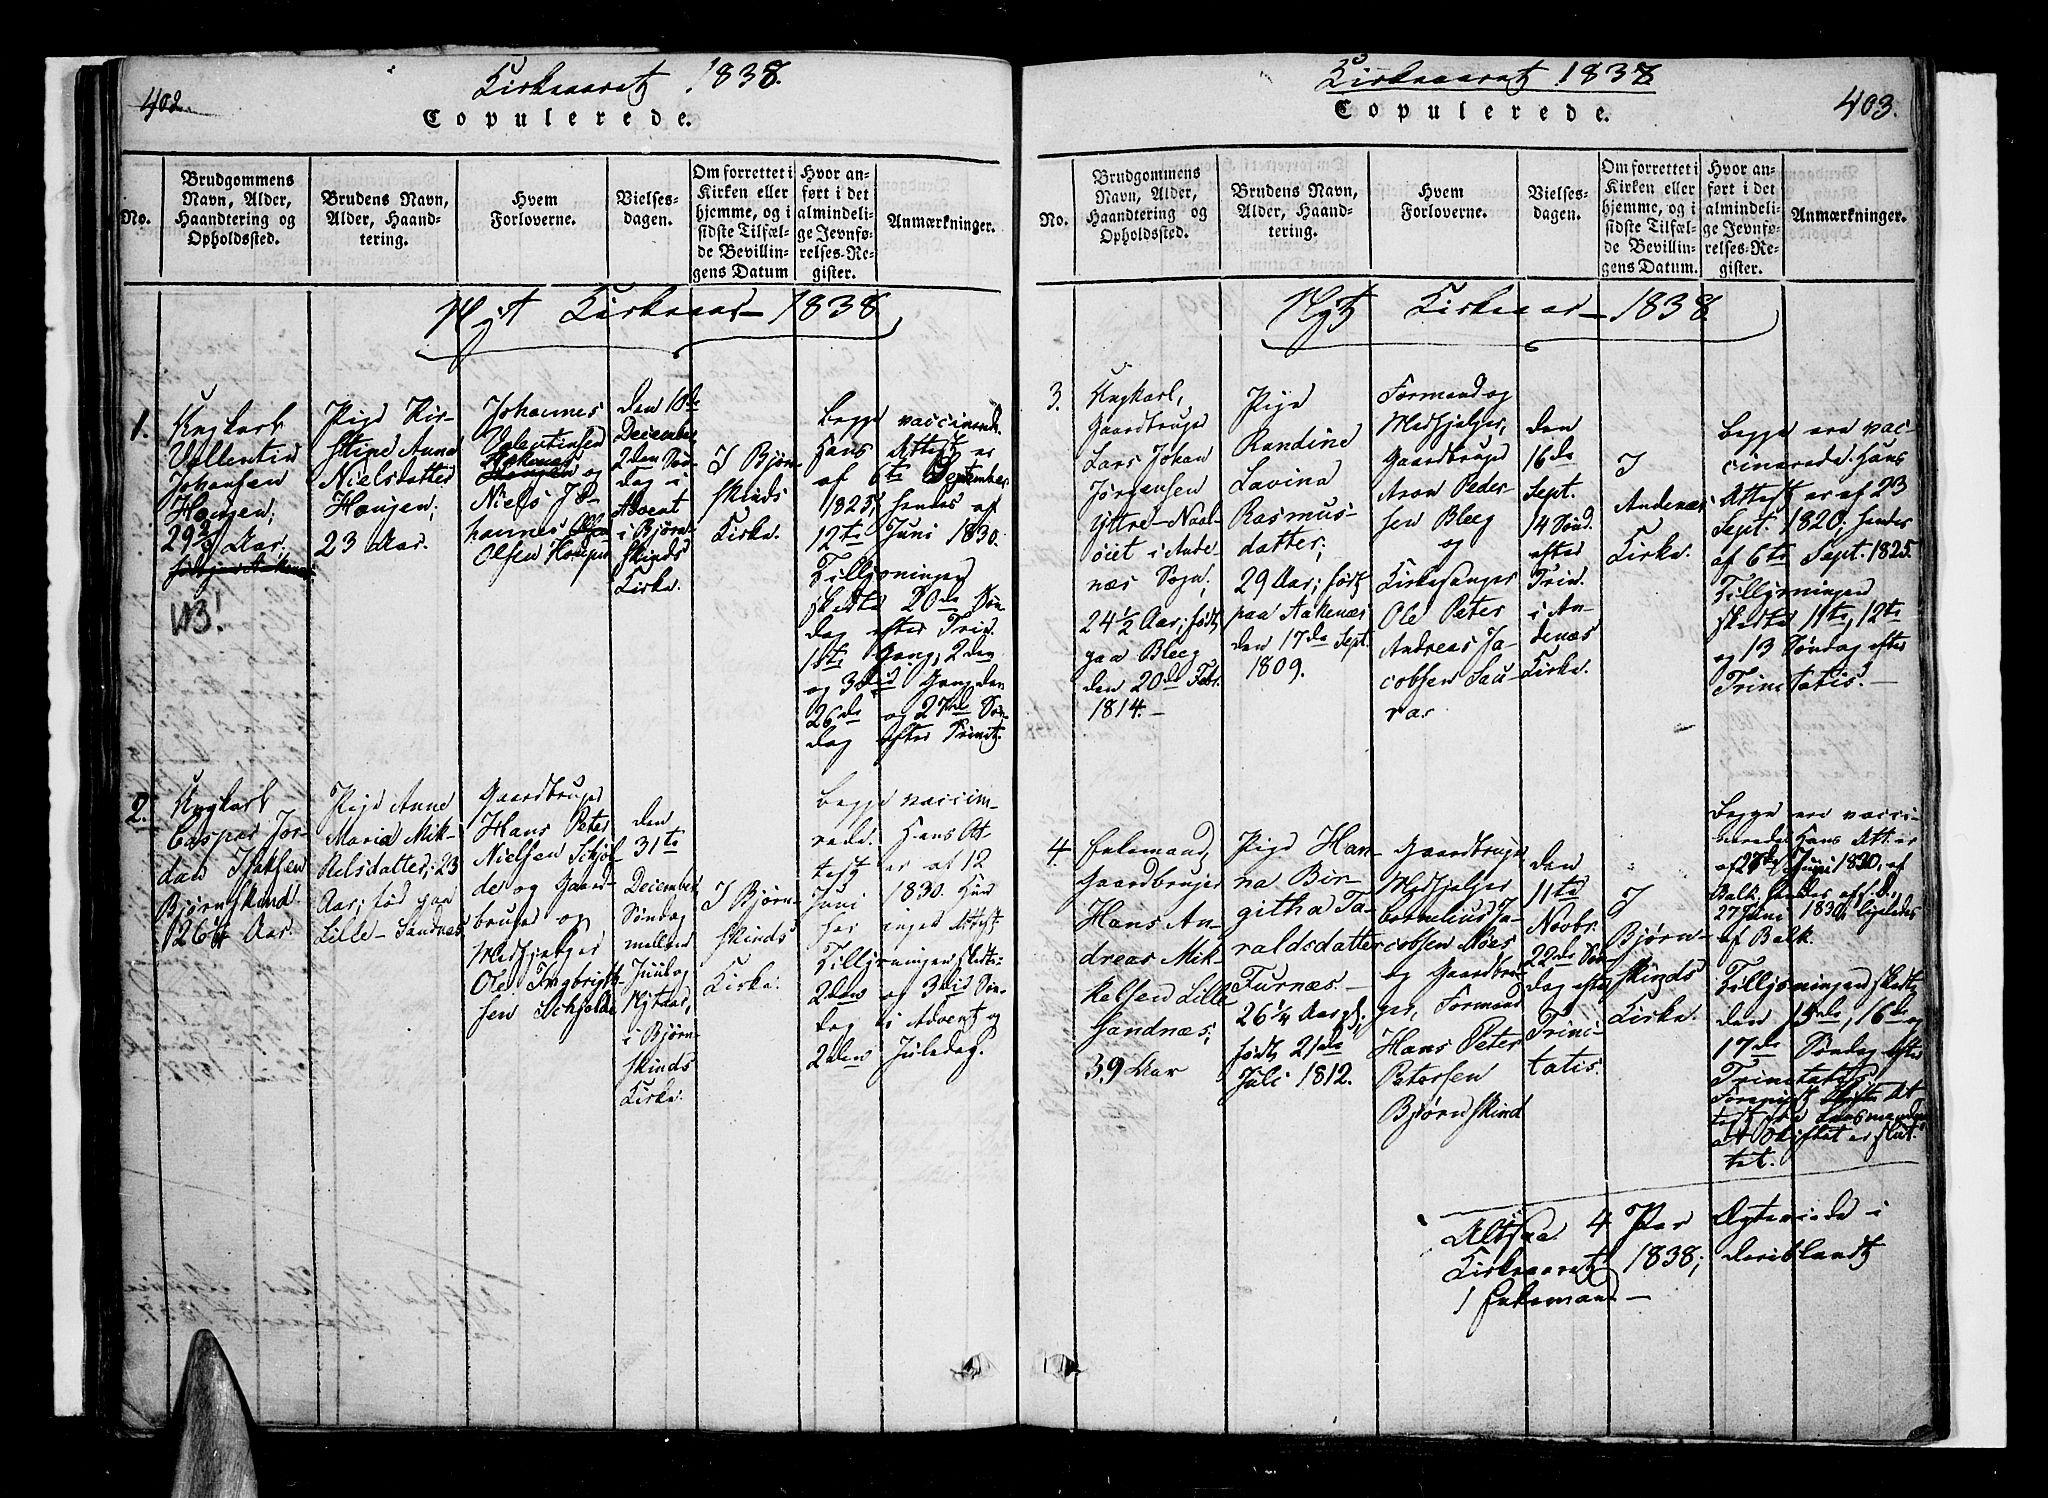 SAT, Ministerialprotokoller, klokkerbøker og fødselsregistre - Nordland, 897/L1395: Ministerialbok nr. 897A03, 1820-1841, s. 402-403